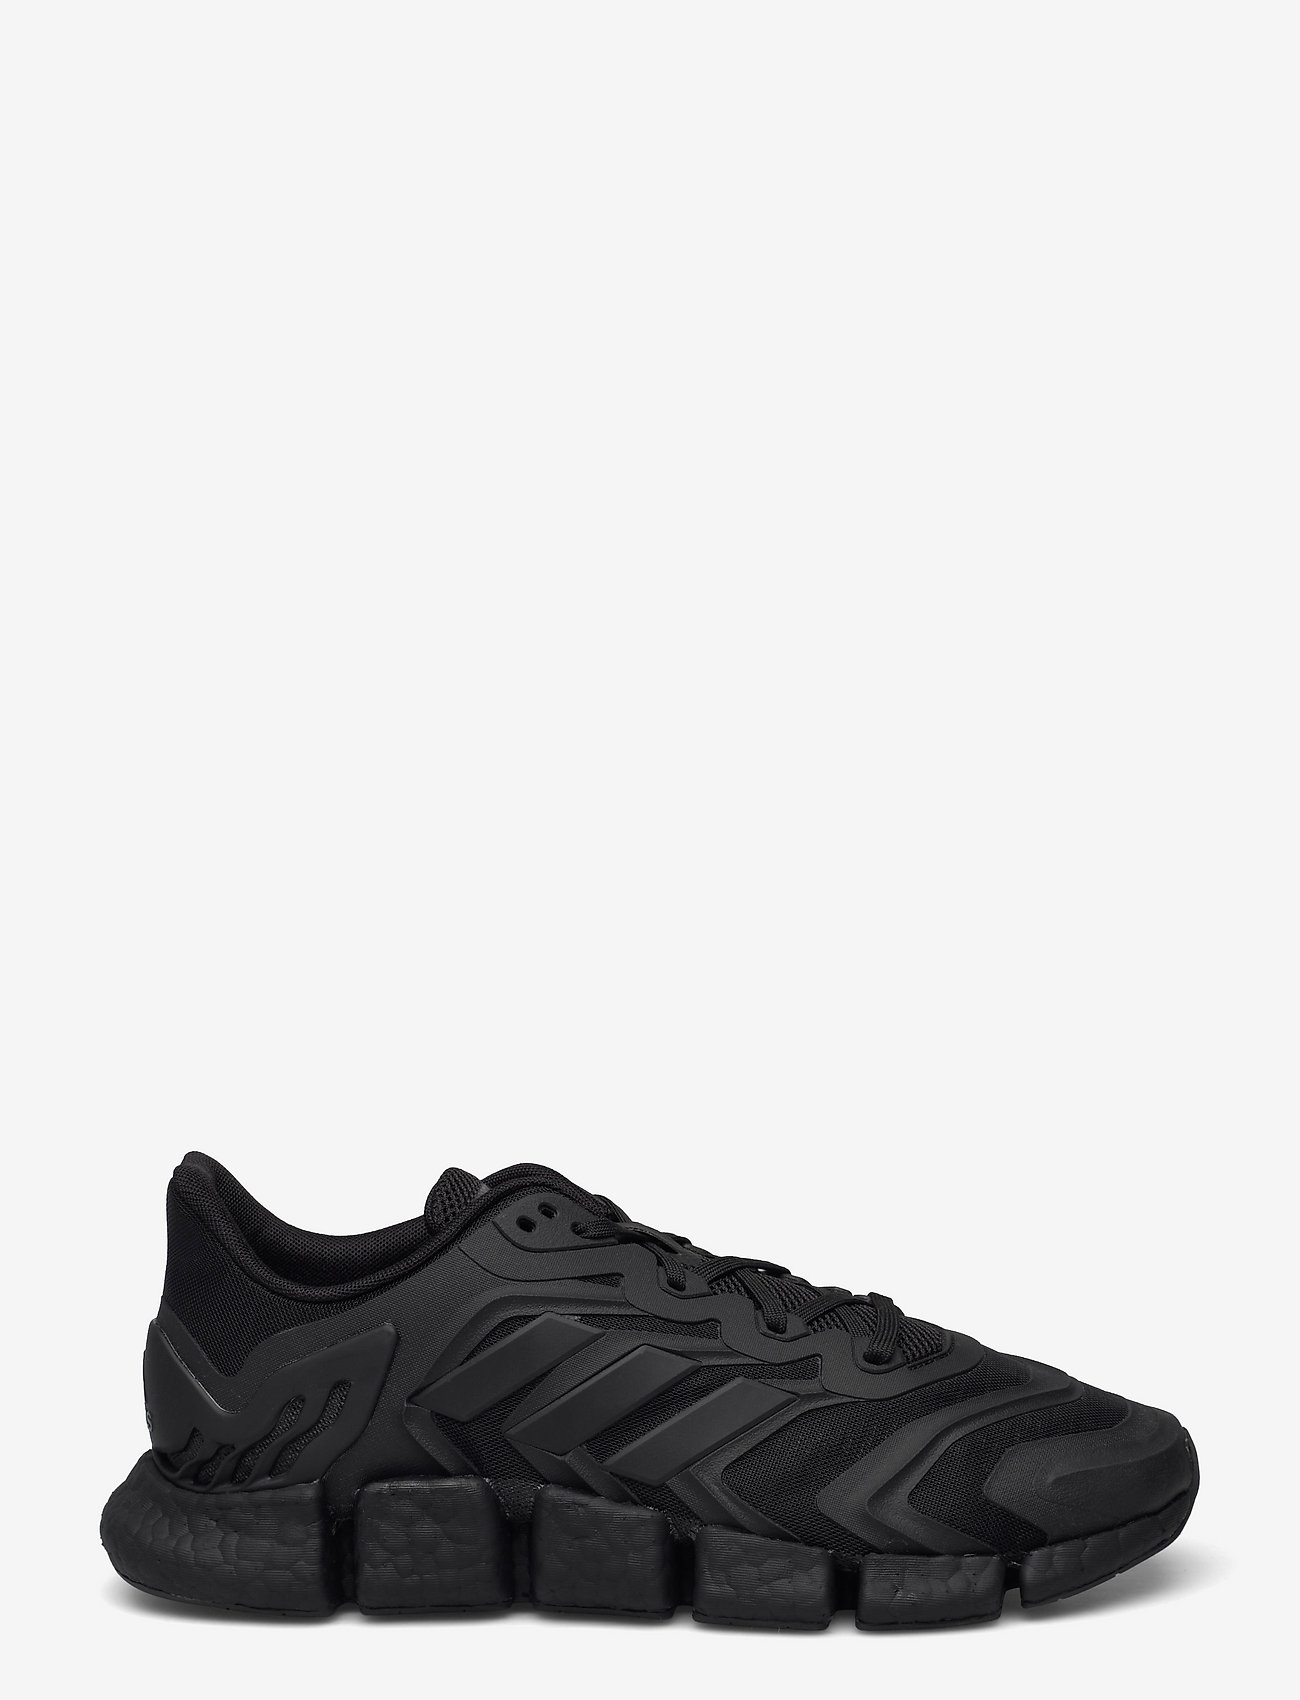 adidas Performance - Climacool Vento - running shoes - cblack/cblack/cblack - 1